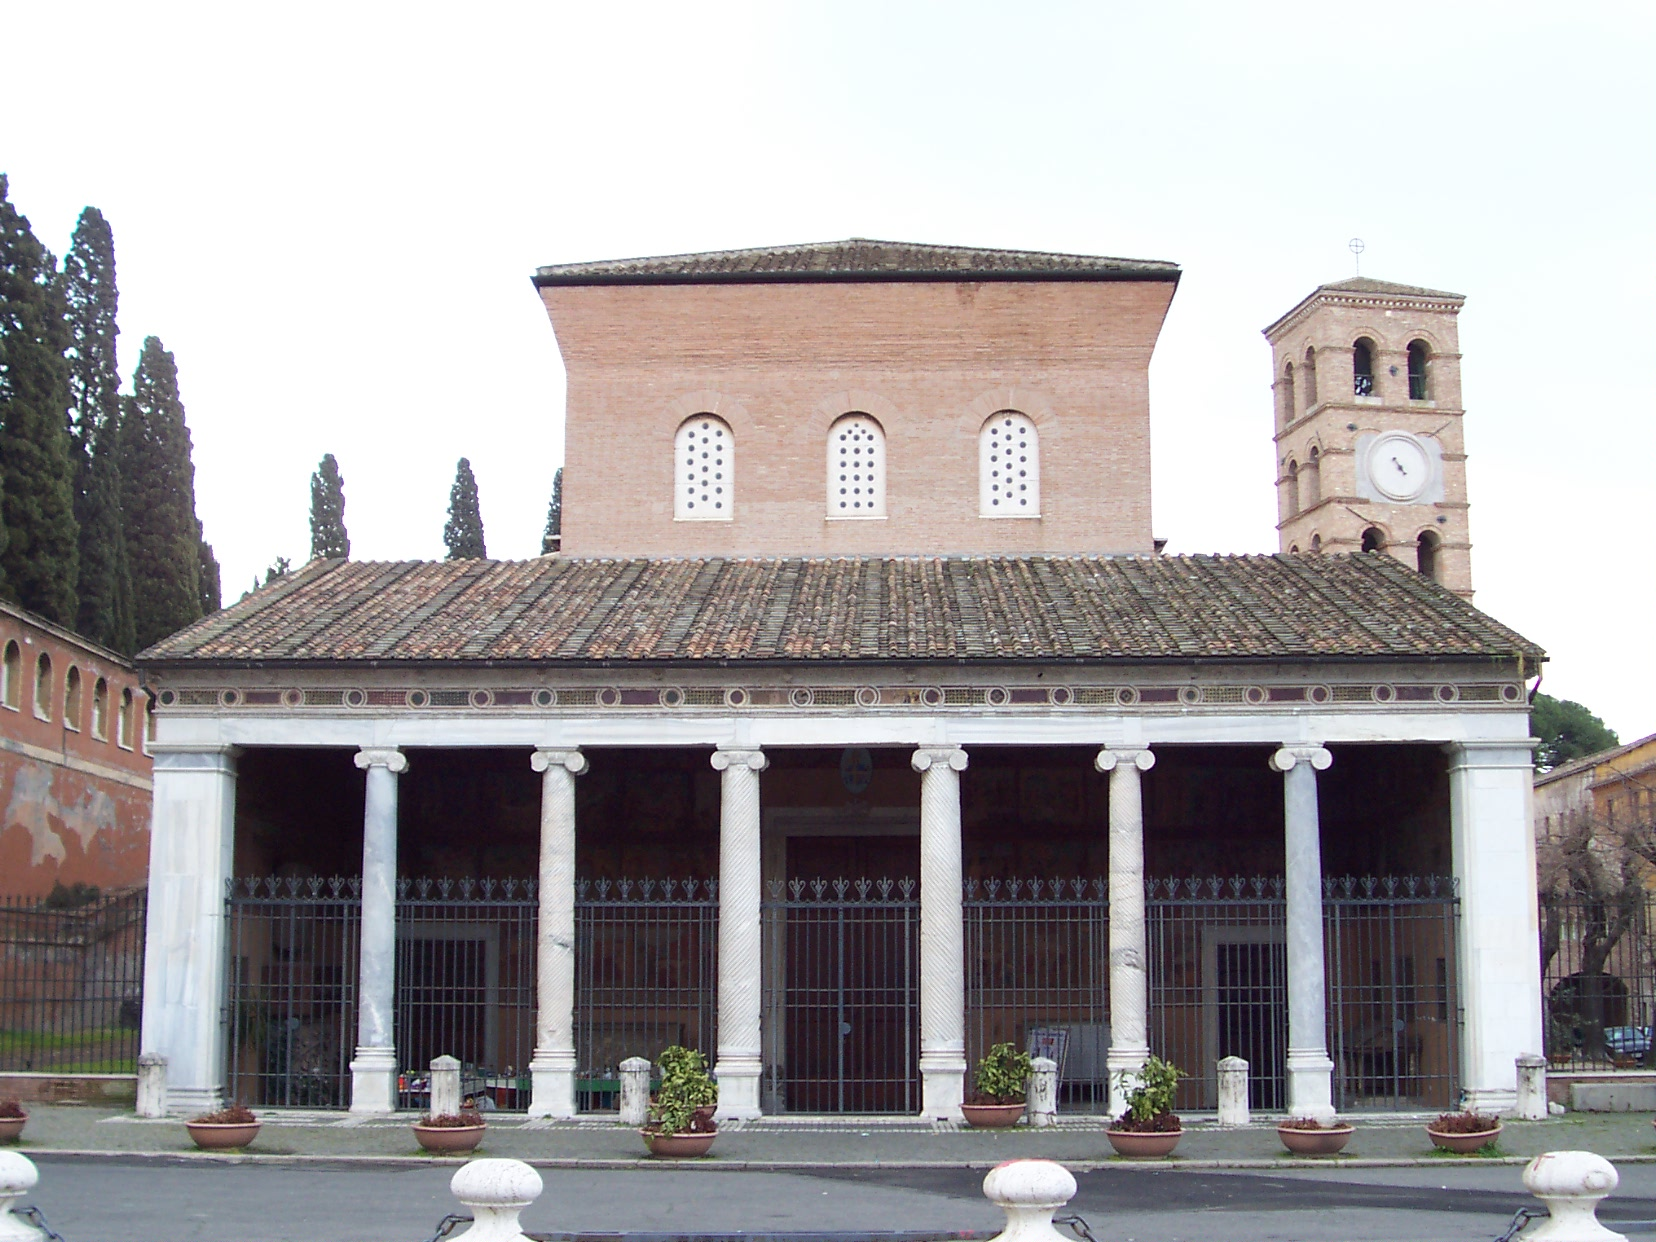 http://fr.academic.ru/pictures/frwiki/83/San_Lorenzo_fuori_le_mura_-_facade.jpg